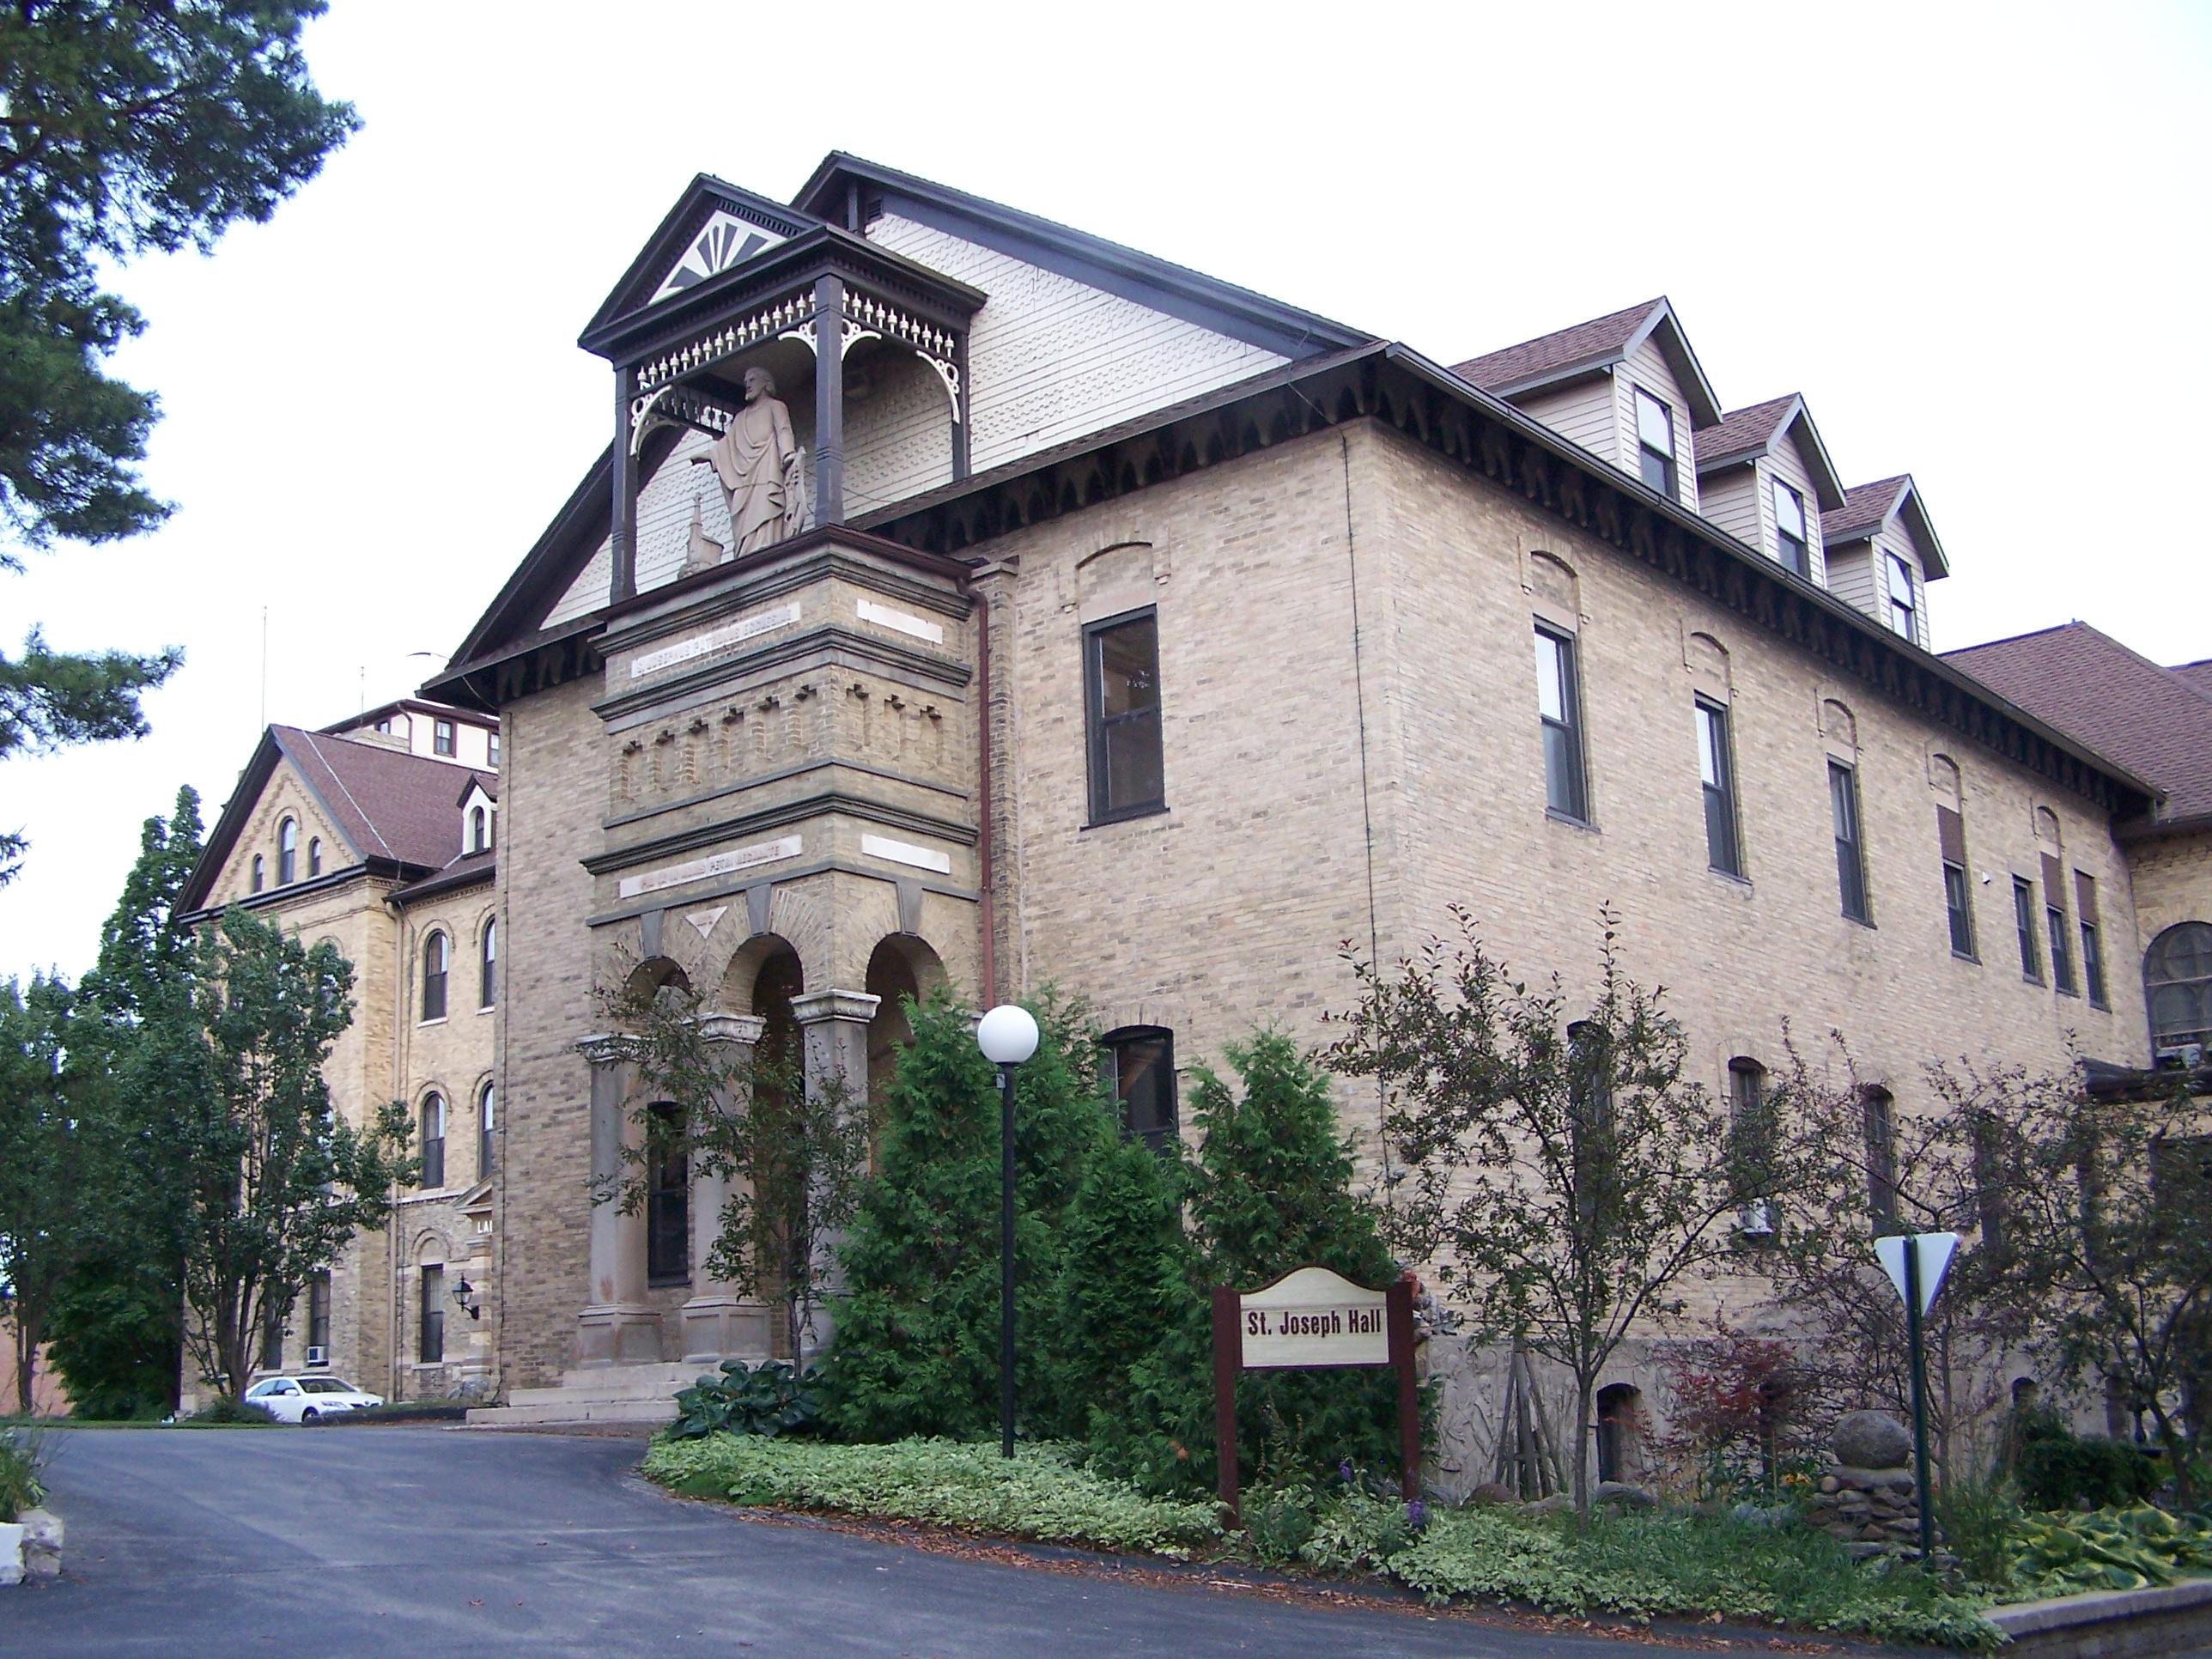 Saint Joseph Hall before fire